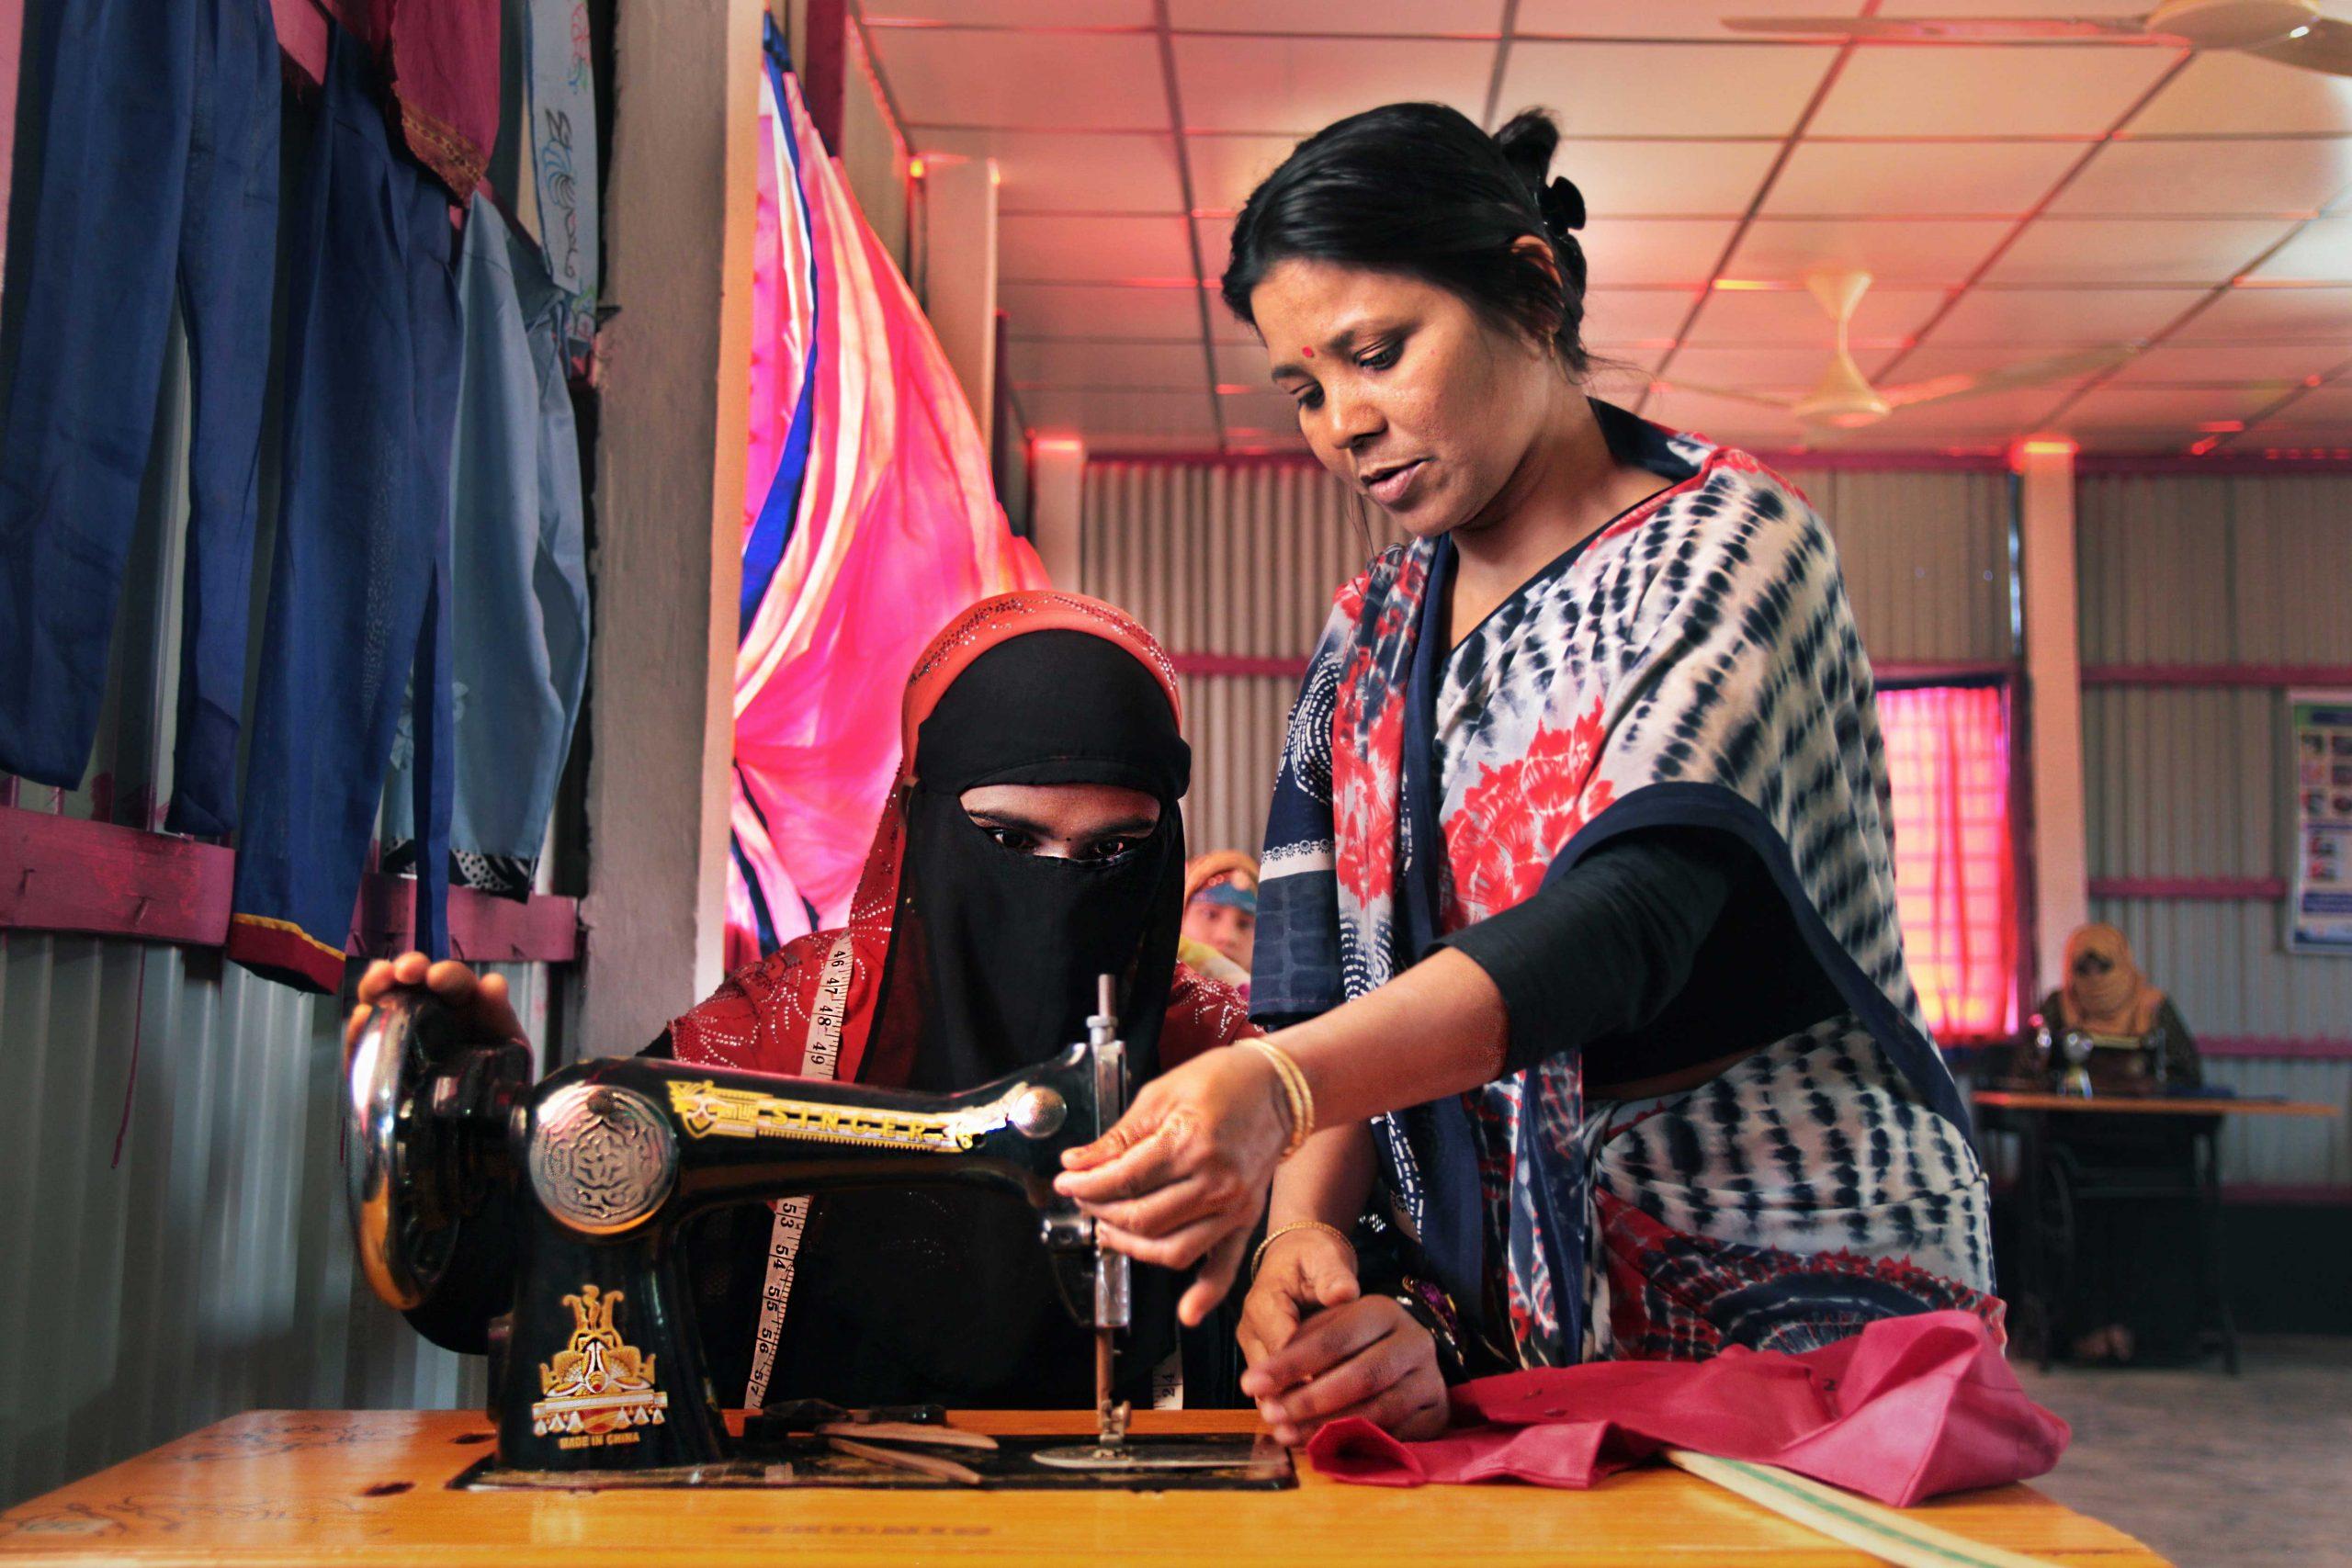 Women at an artisan training center in Cox's Bazar, Bangladesh